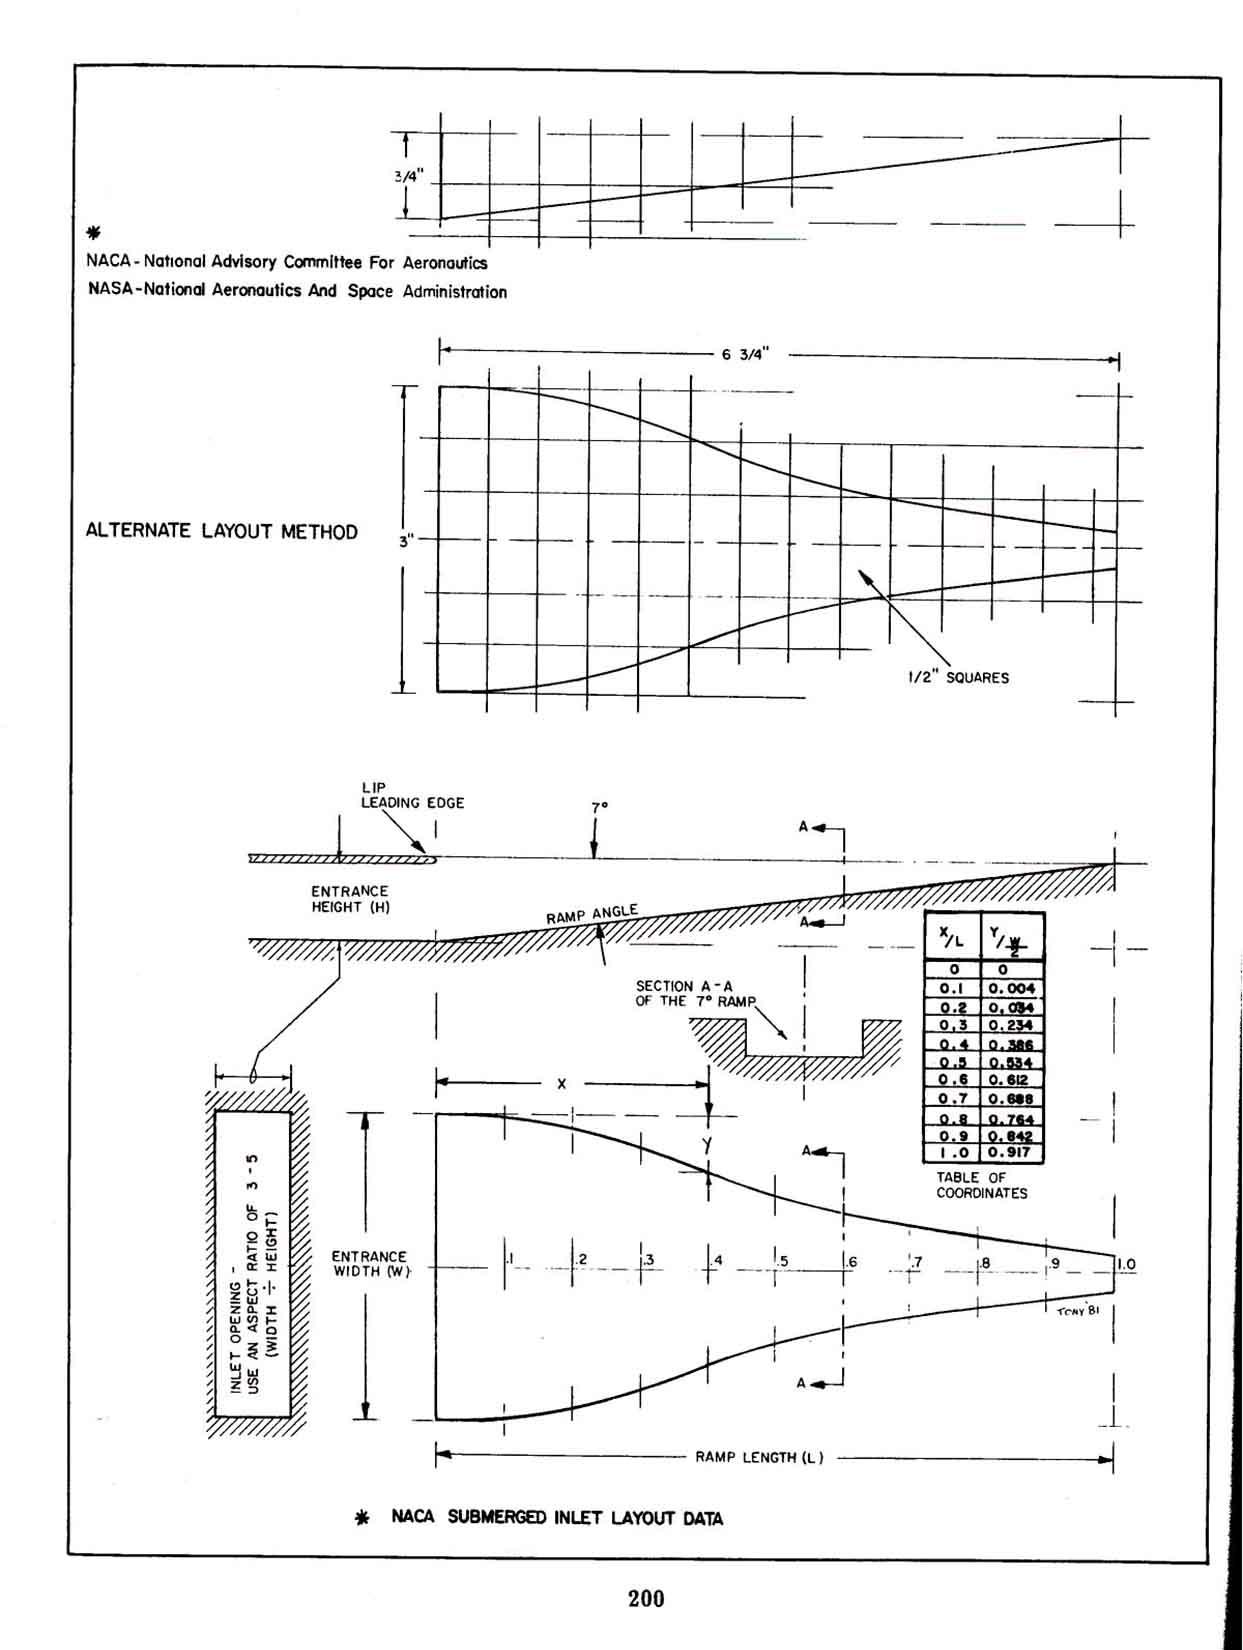 turn signal intake miata visio electrical diagram headlight vs page 3 grassroots